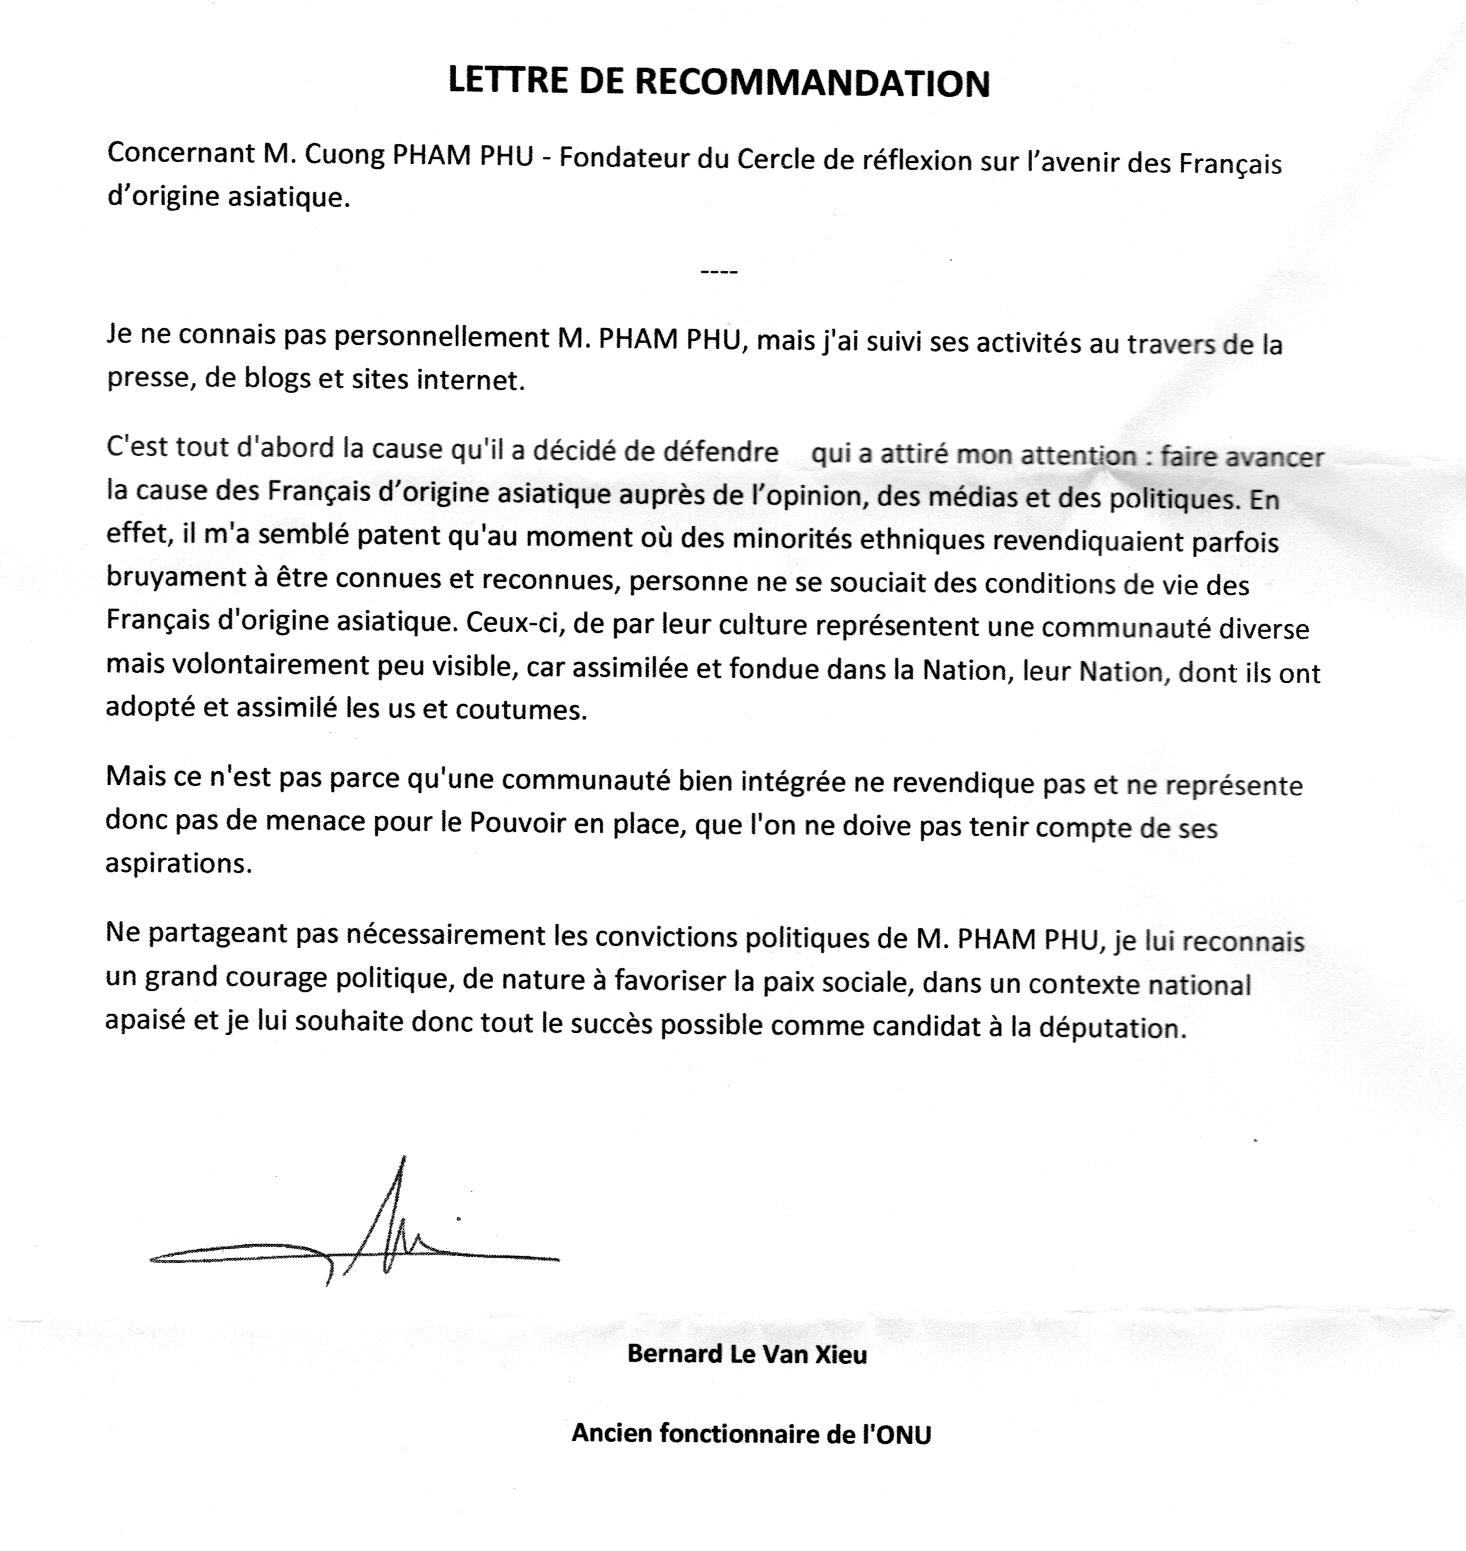 lettre-de-mr-bernard-le.JPG